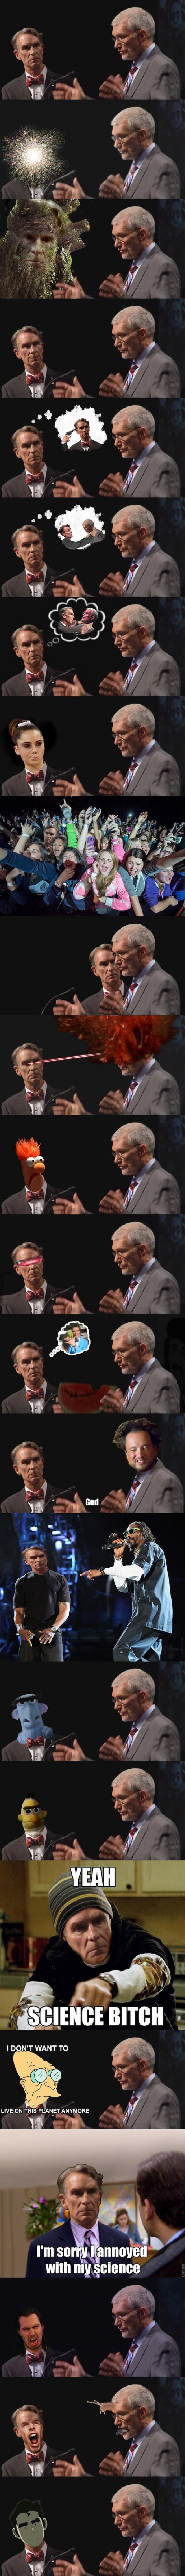 Bill Nye's face